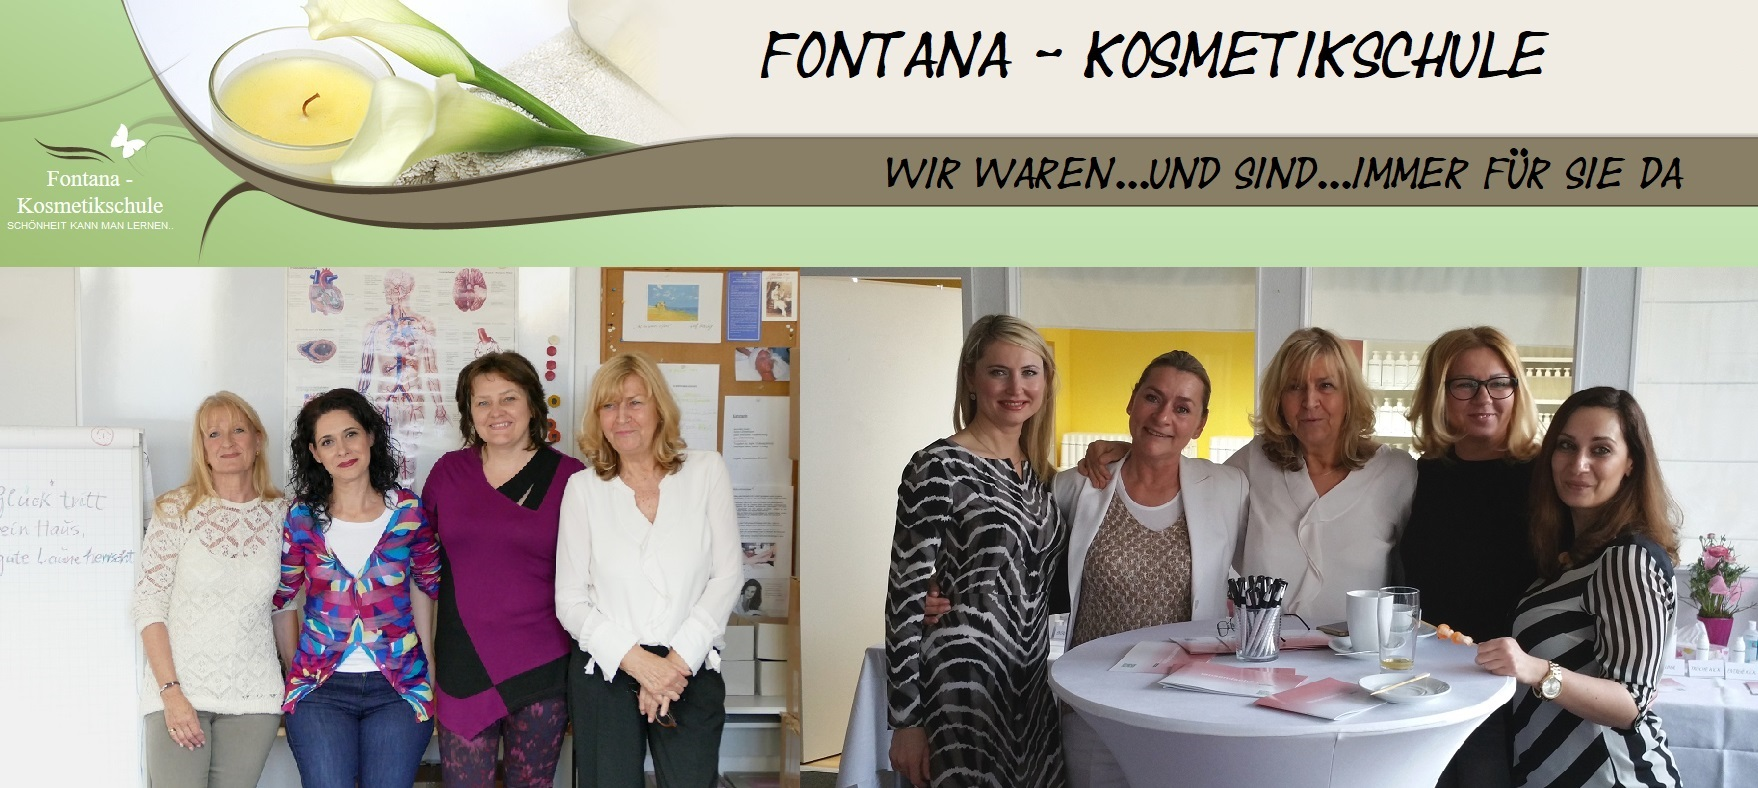 2018-Kosmetikschule-Fontana